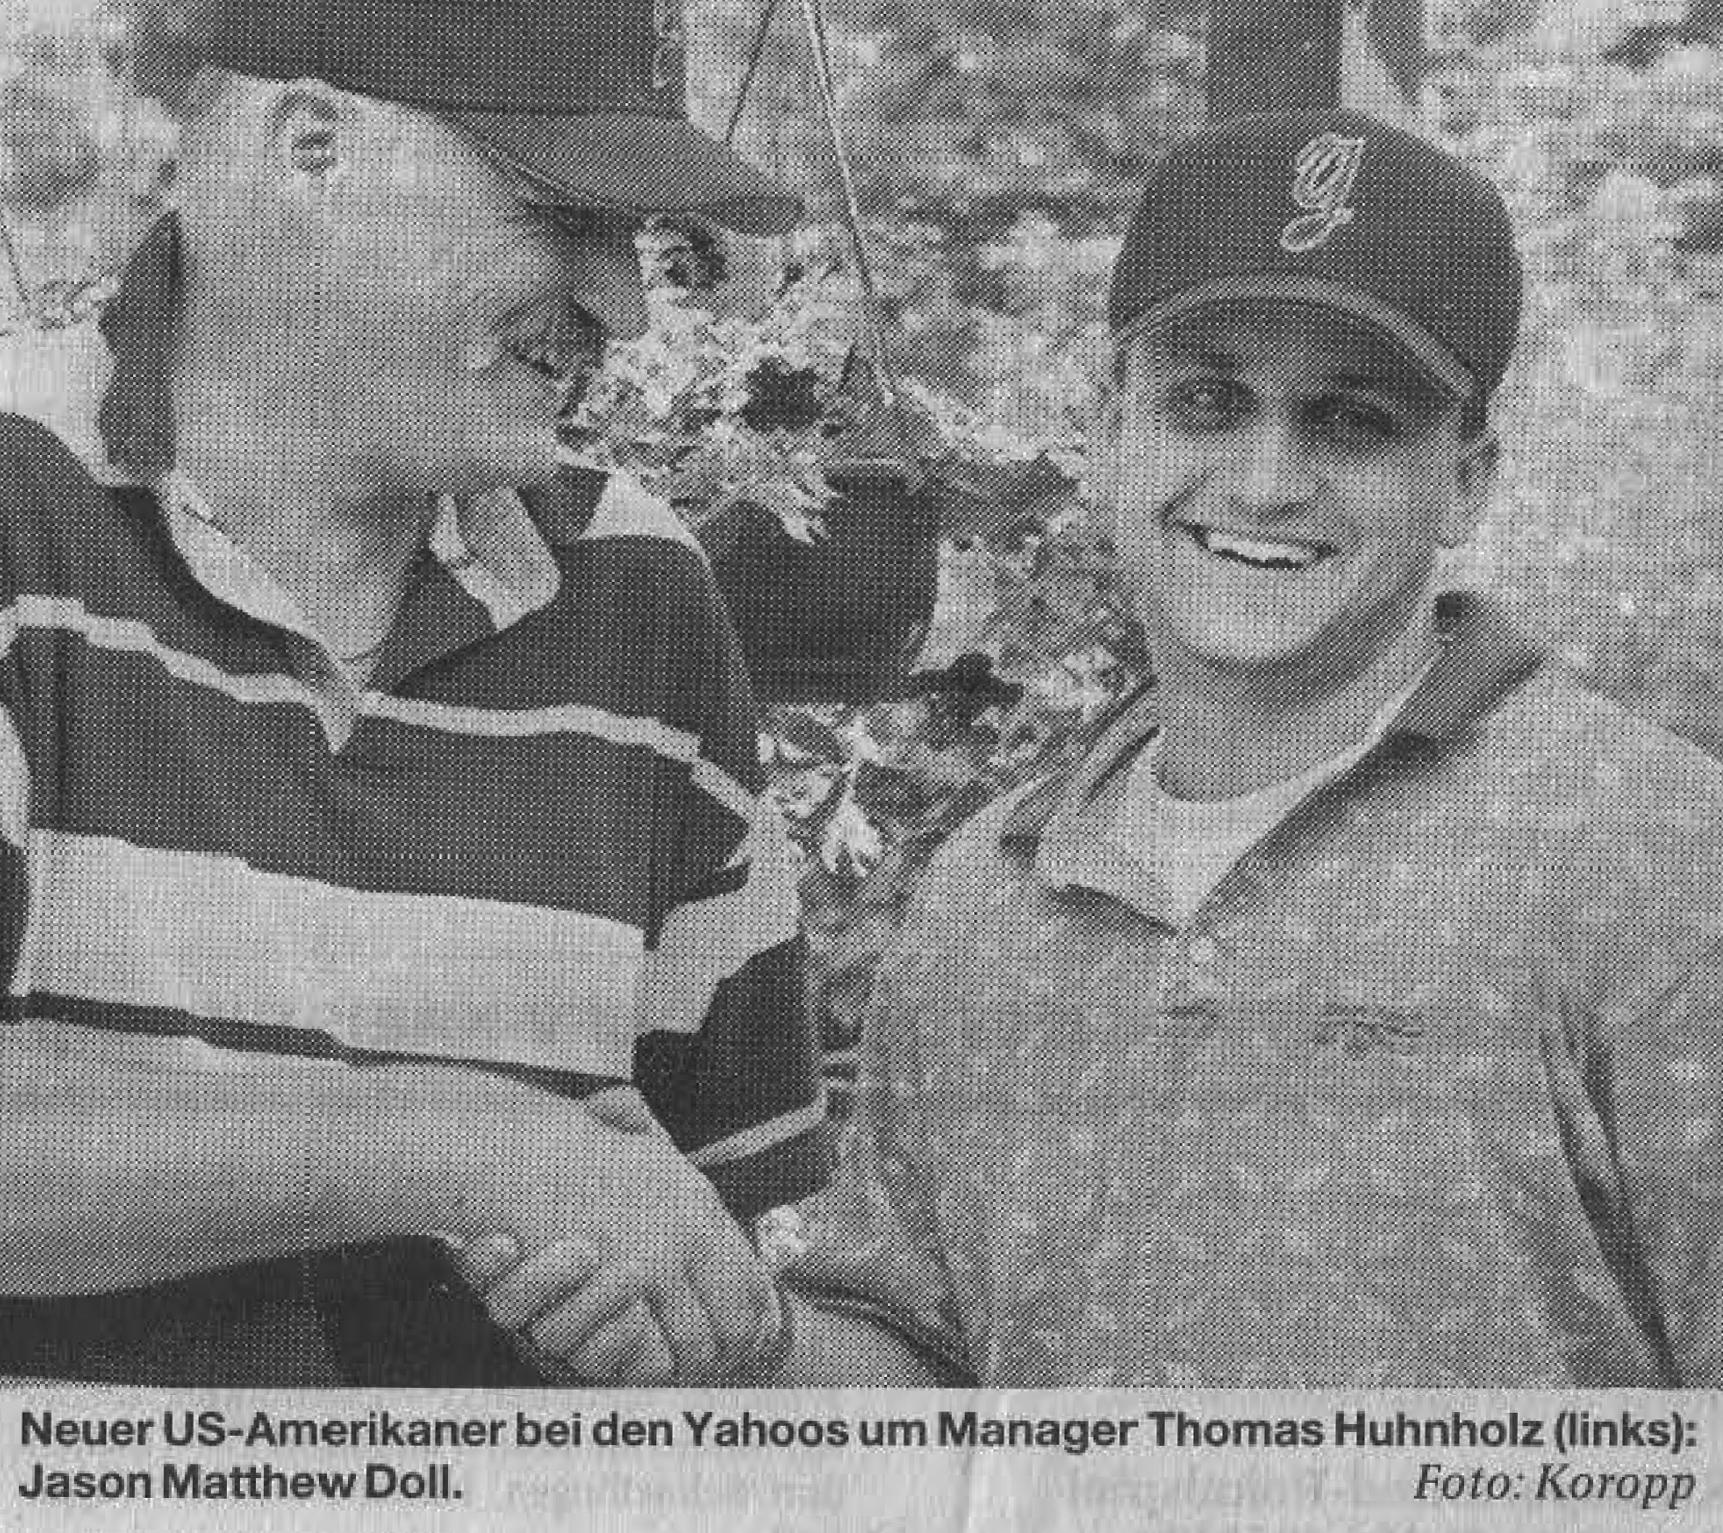 Neuer US-Amerikaner bei den Yahoos um Manager Thomas Huhnholz (links): Jason Matthew Doll. Foto: Koropp